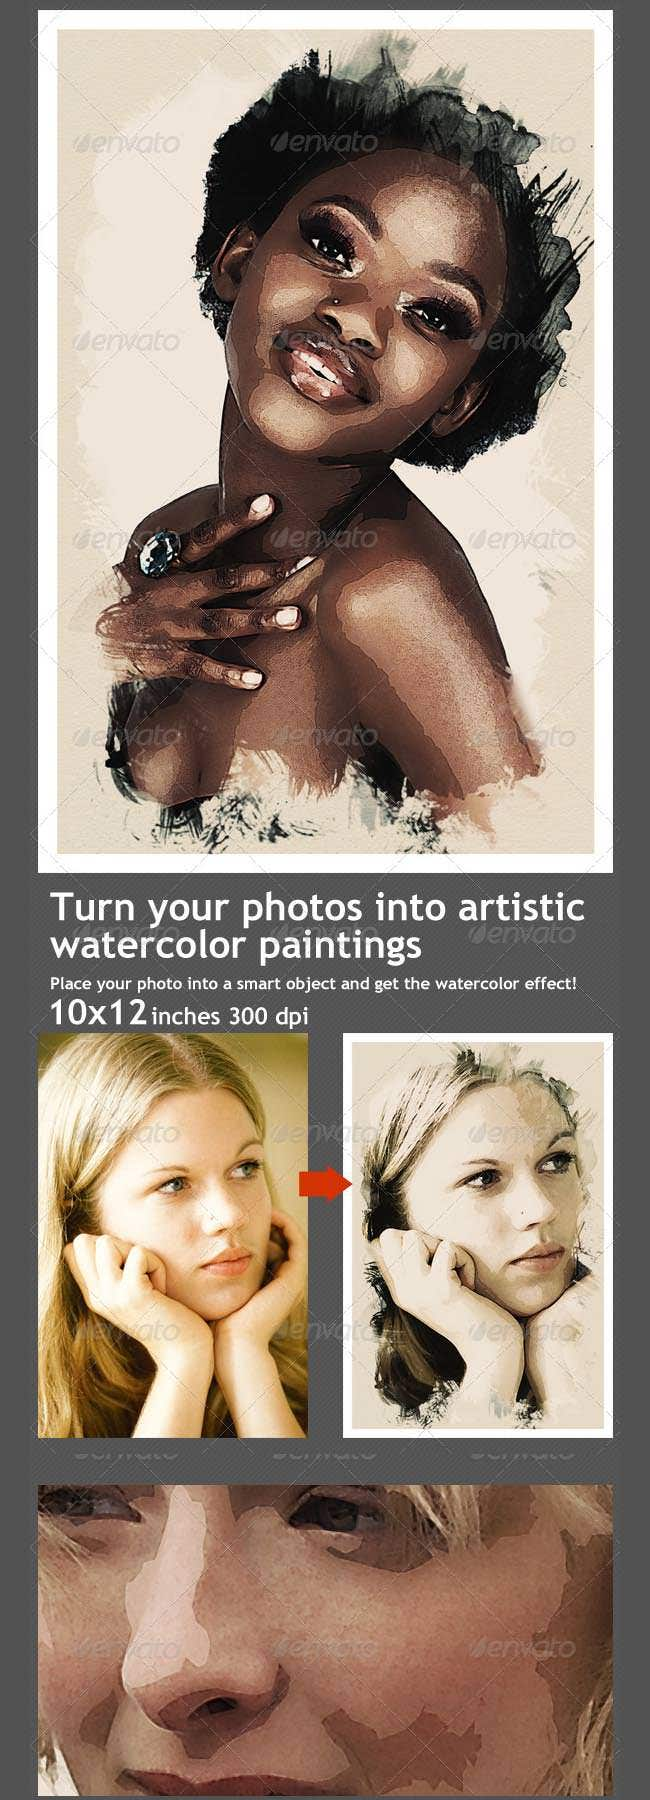 artistic watercolor portrait creation